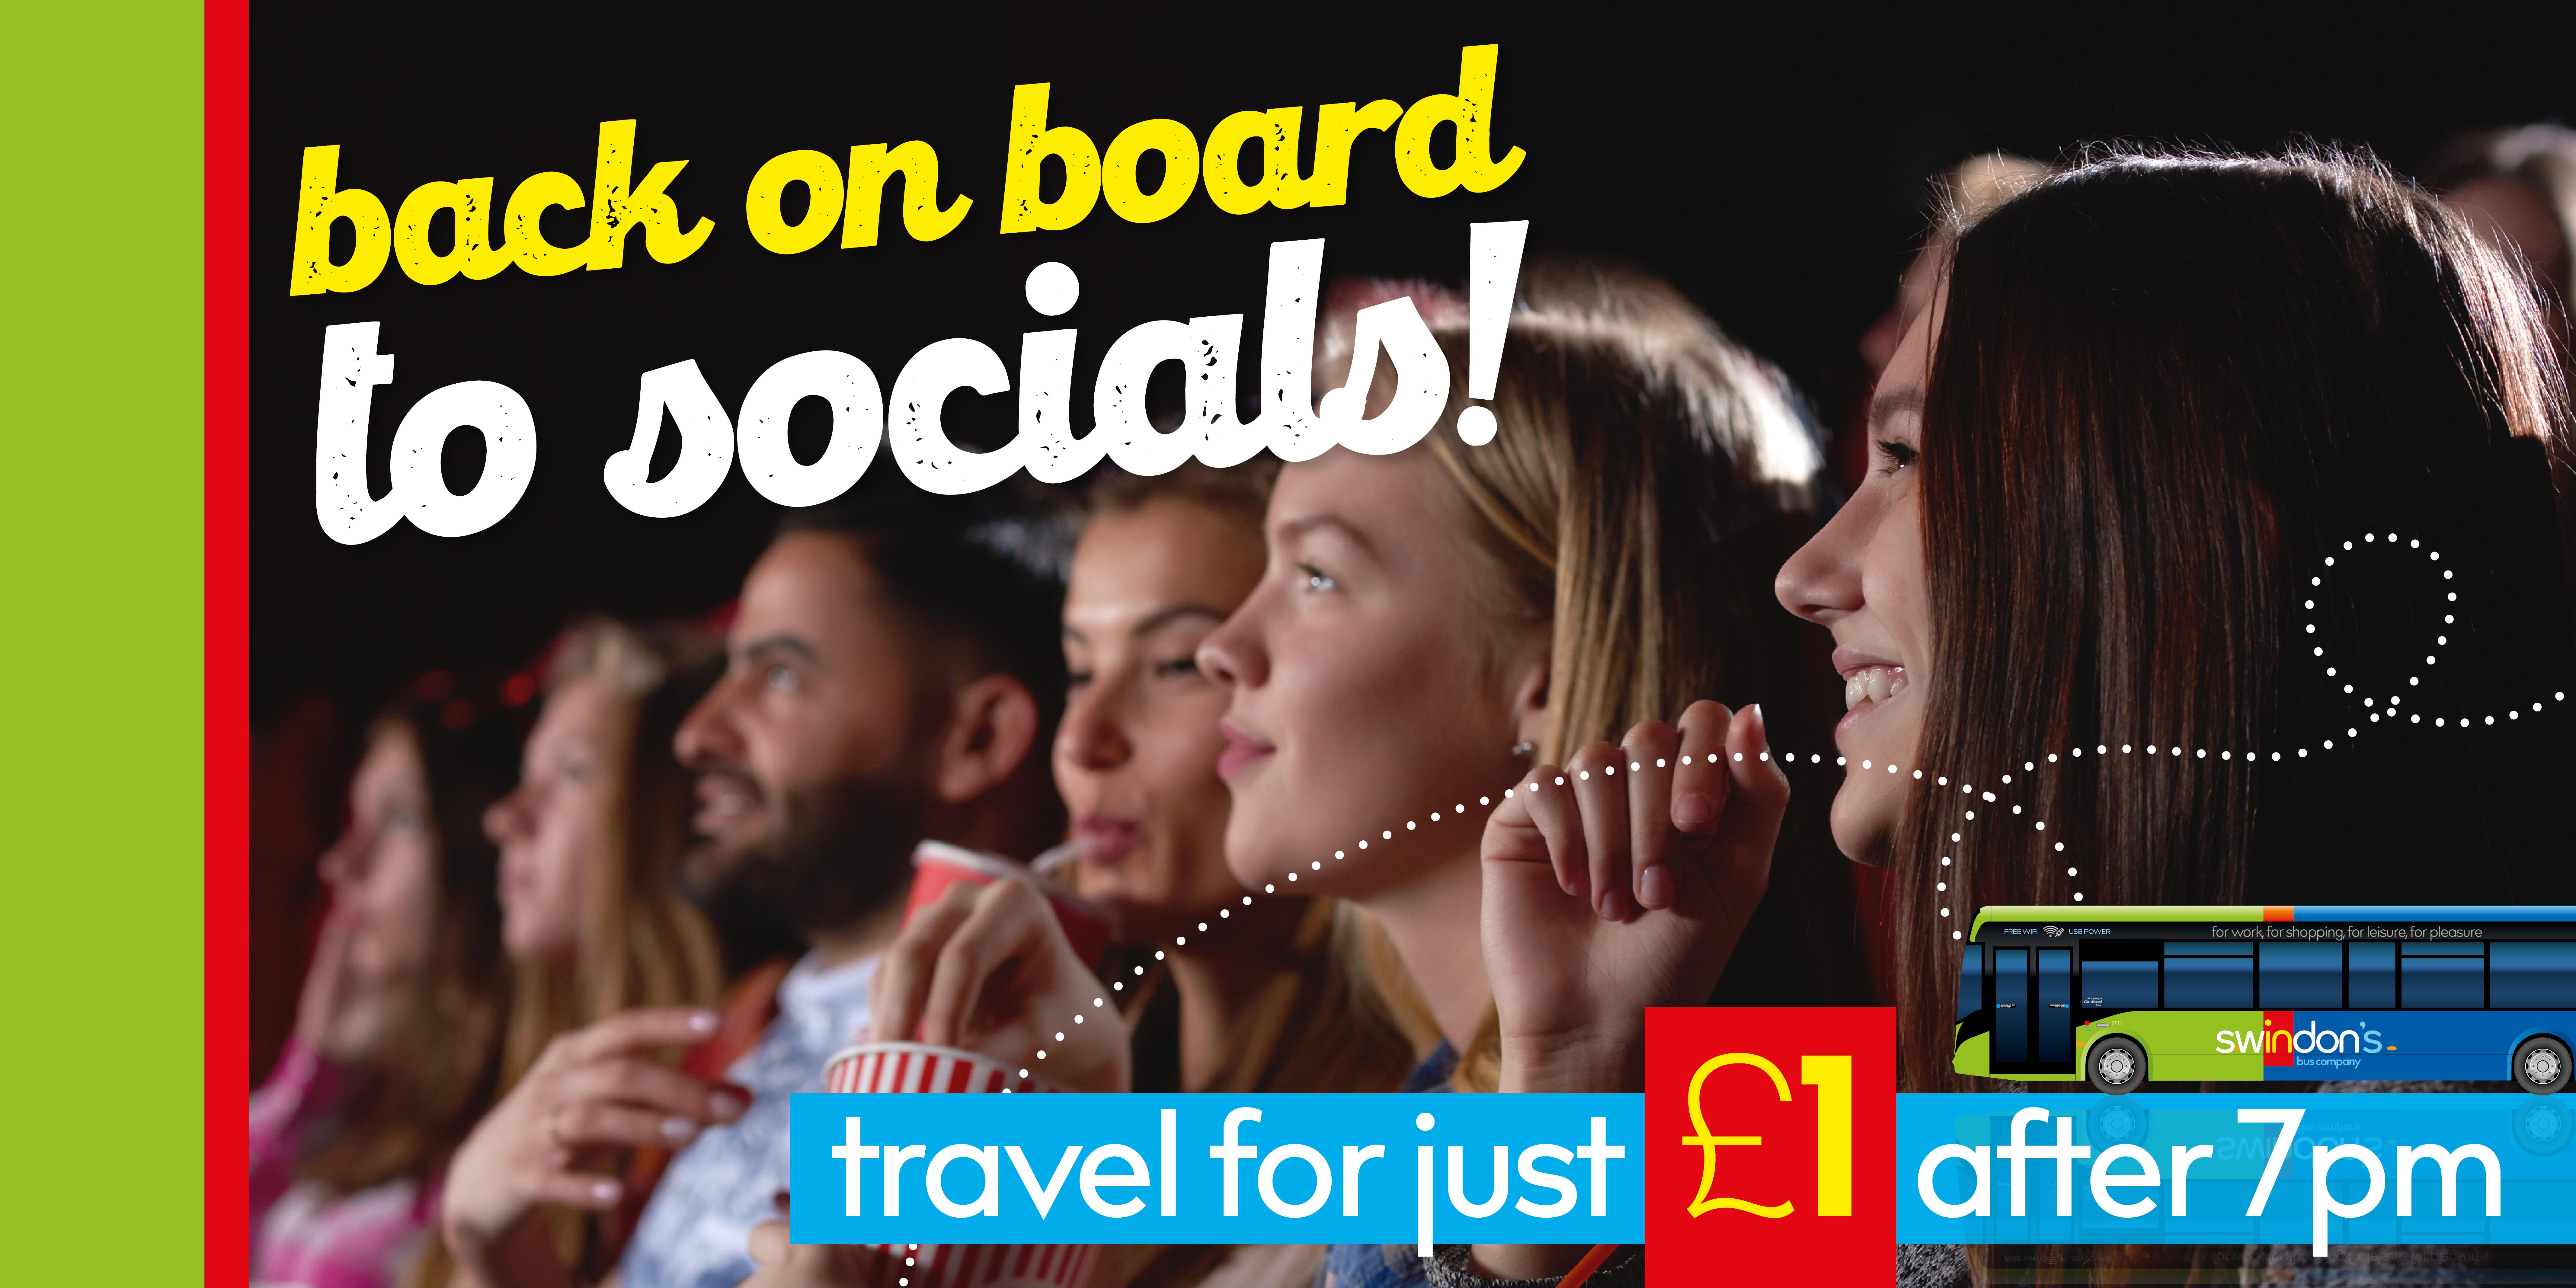 Swindon Bus summer social fare